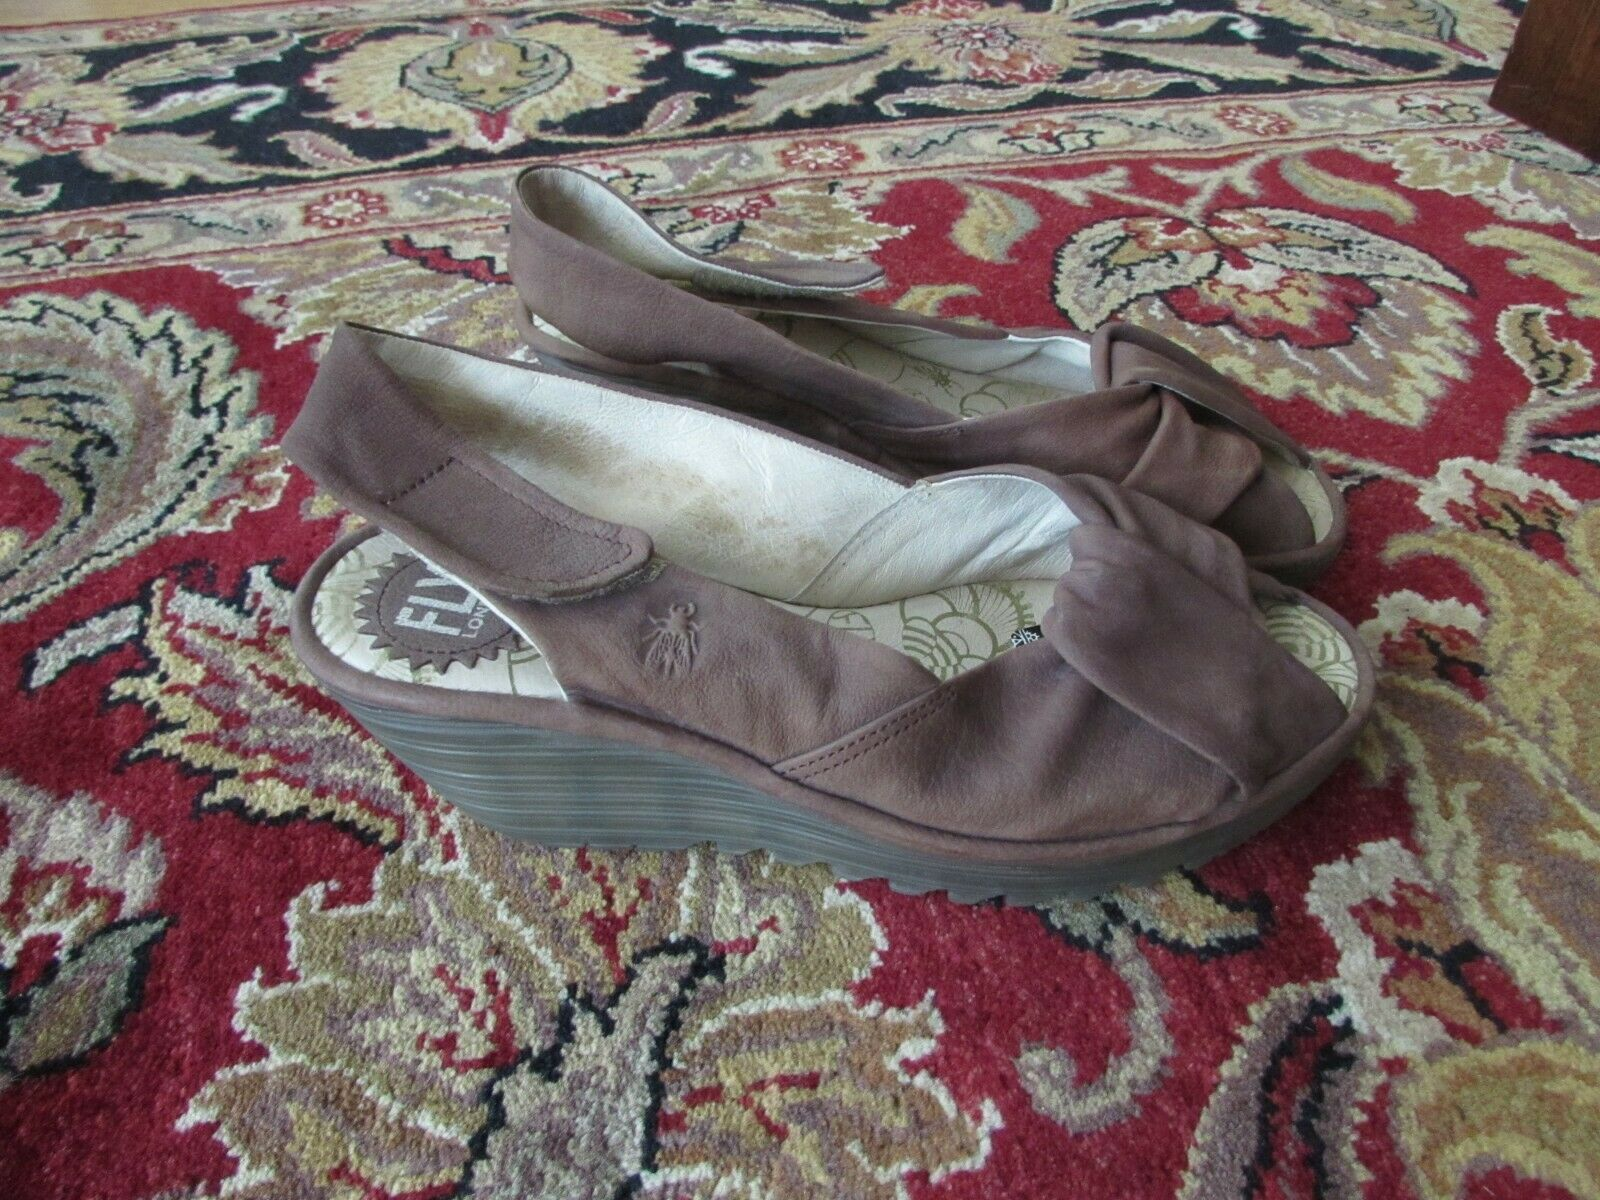 Fly London Women Platform Wedges Open Toe Sandals shoes Size 9